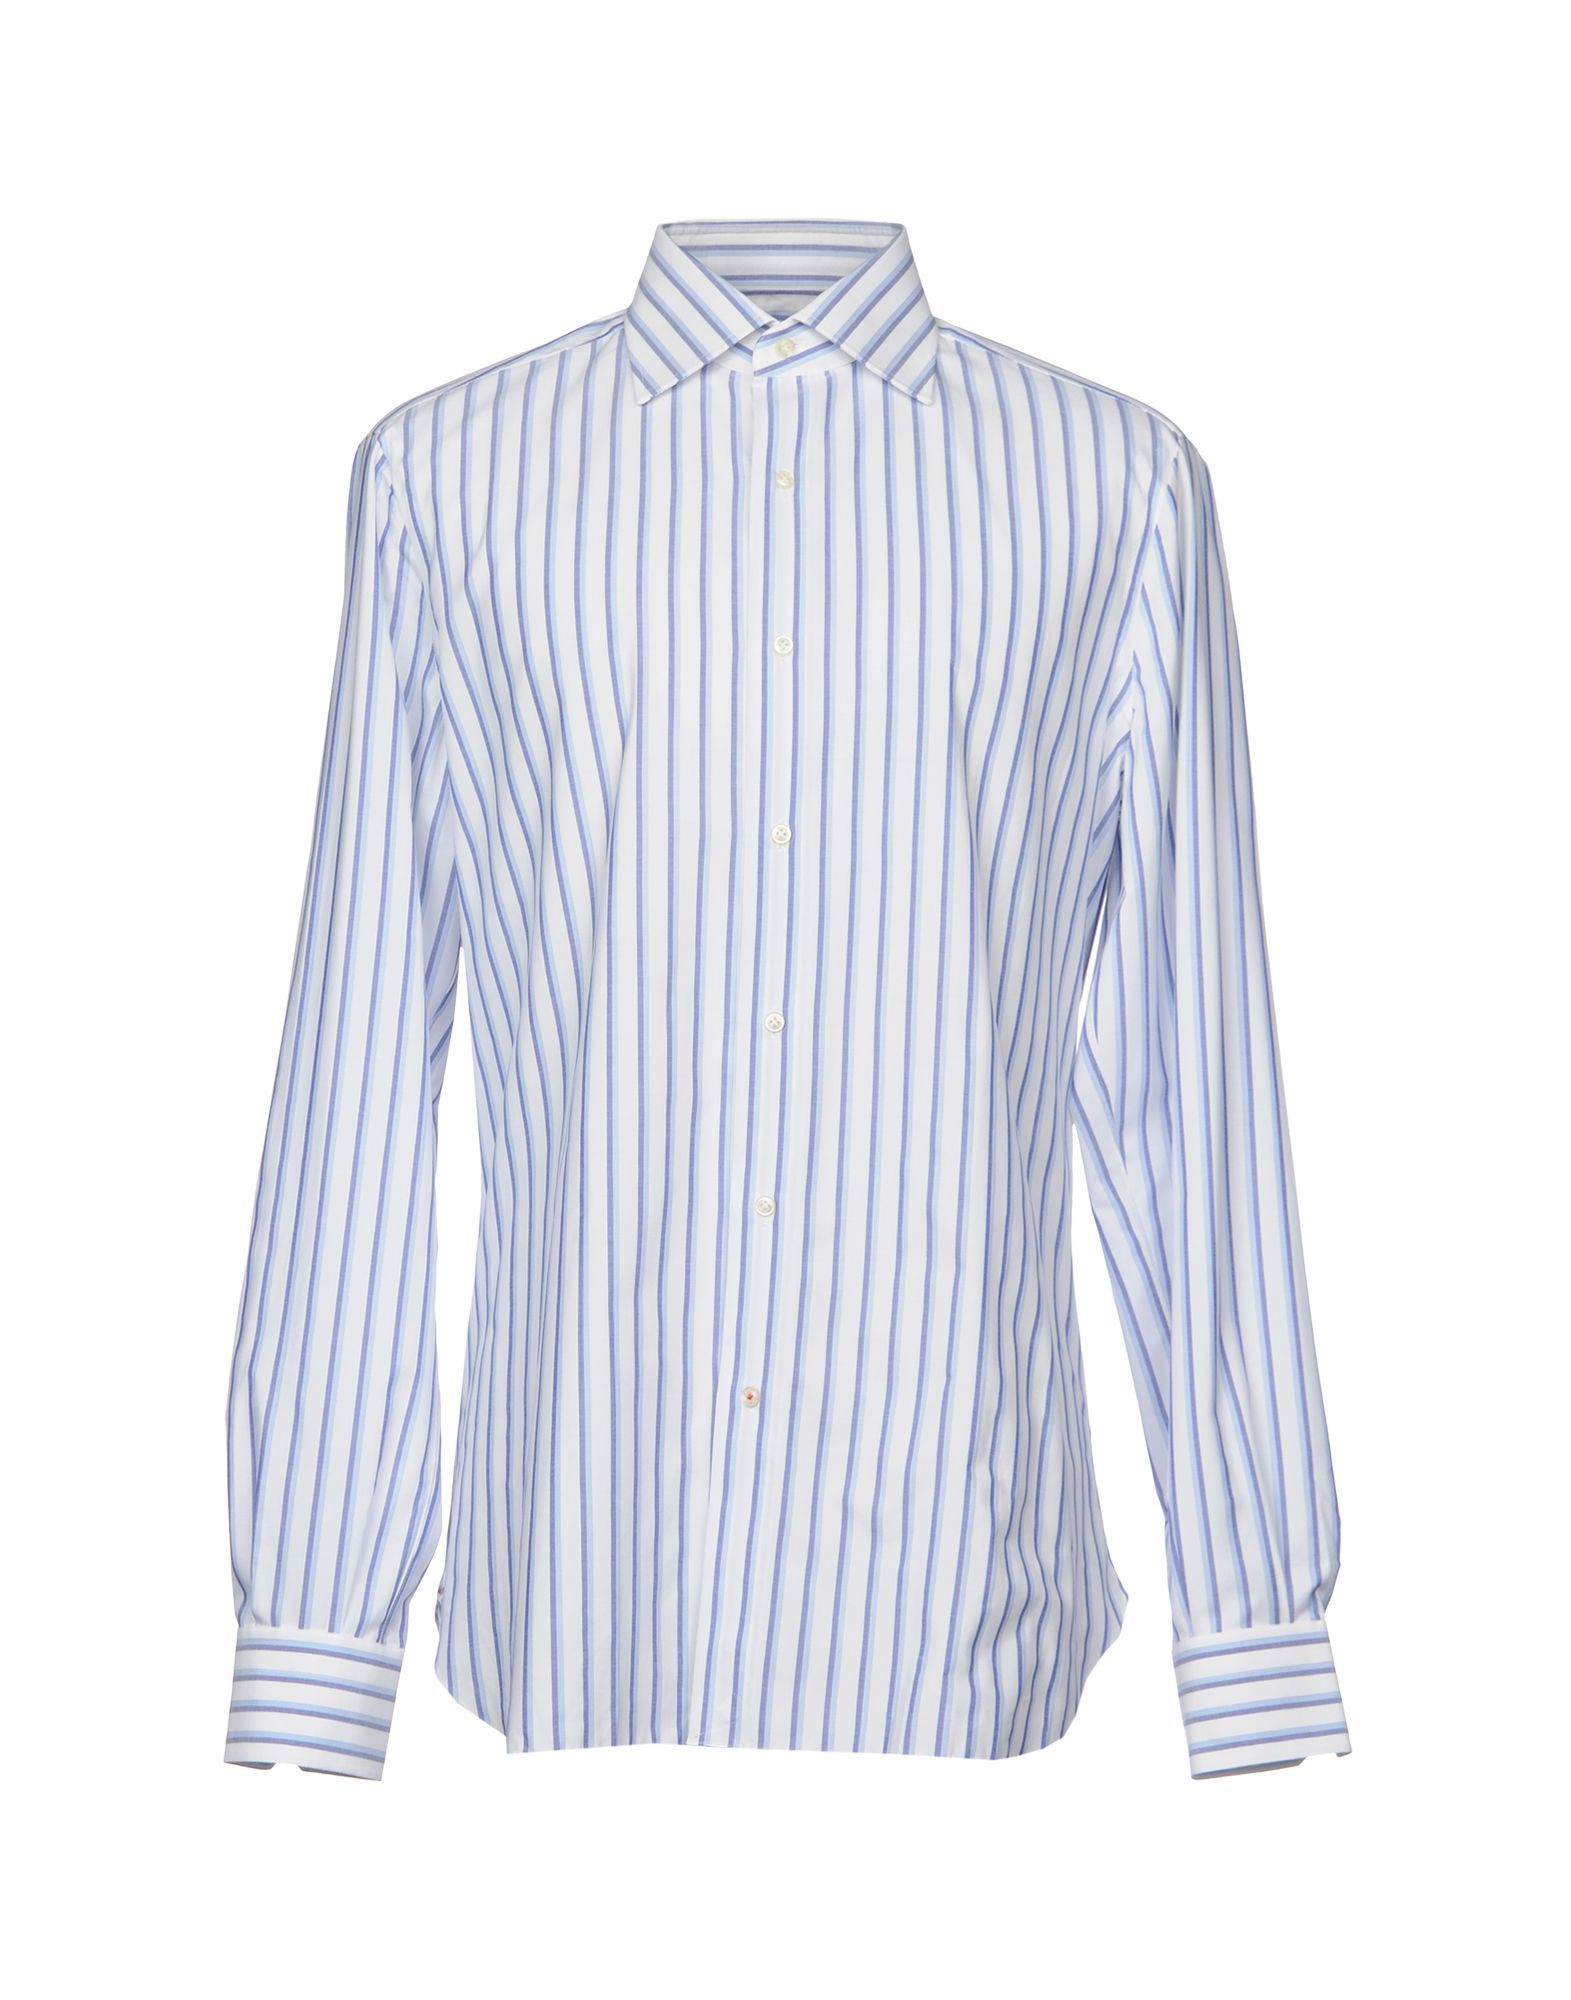 4842763d Mens Blue Striped Shirt Uk | RLDM